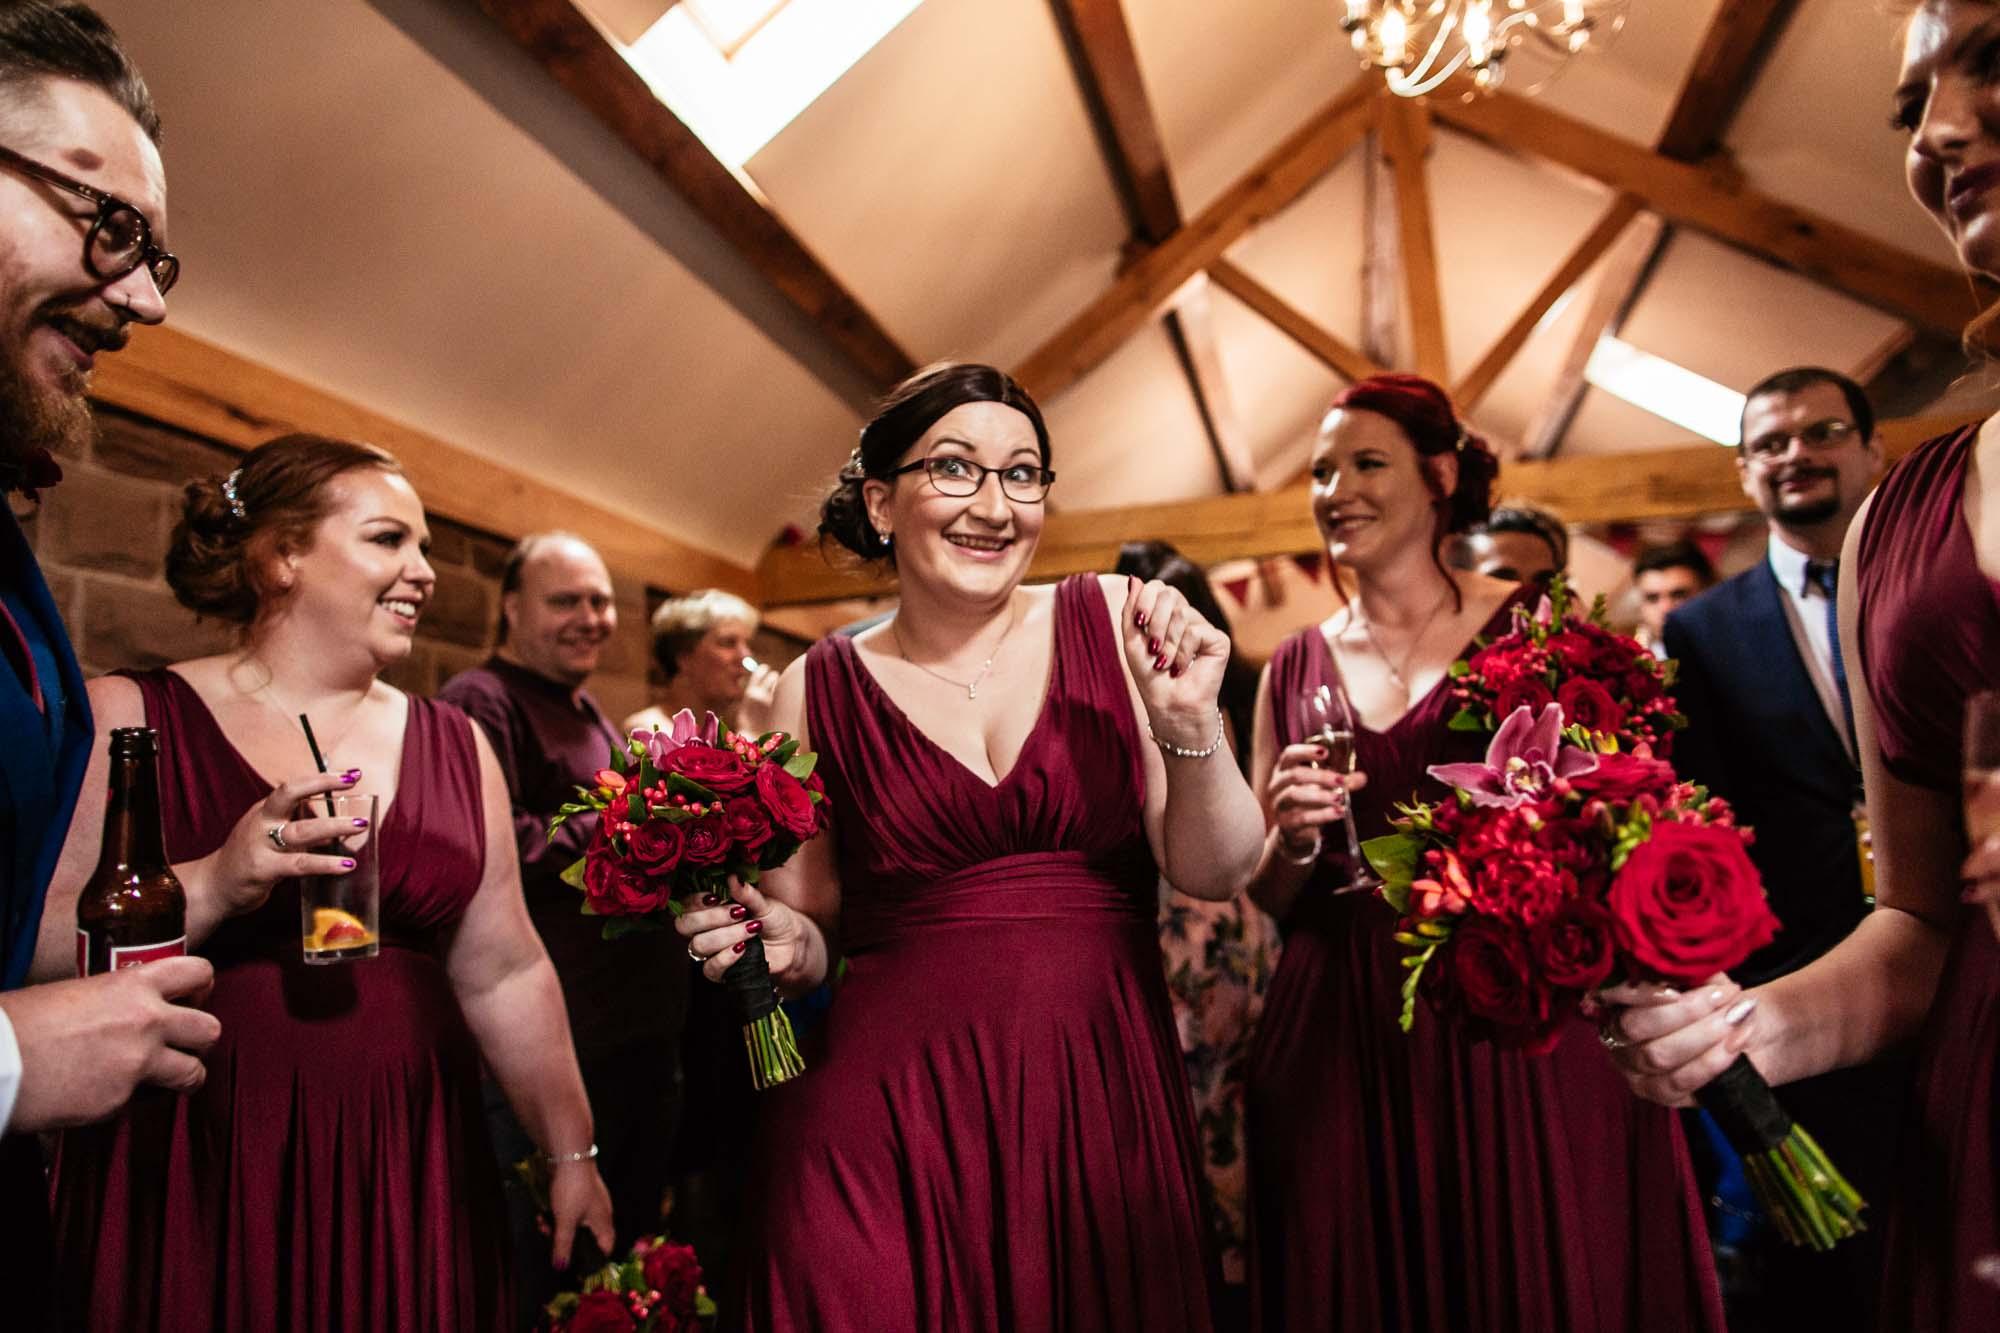 Heaton House Farm Wedding Reception